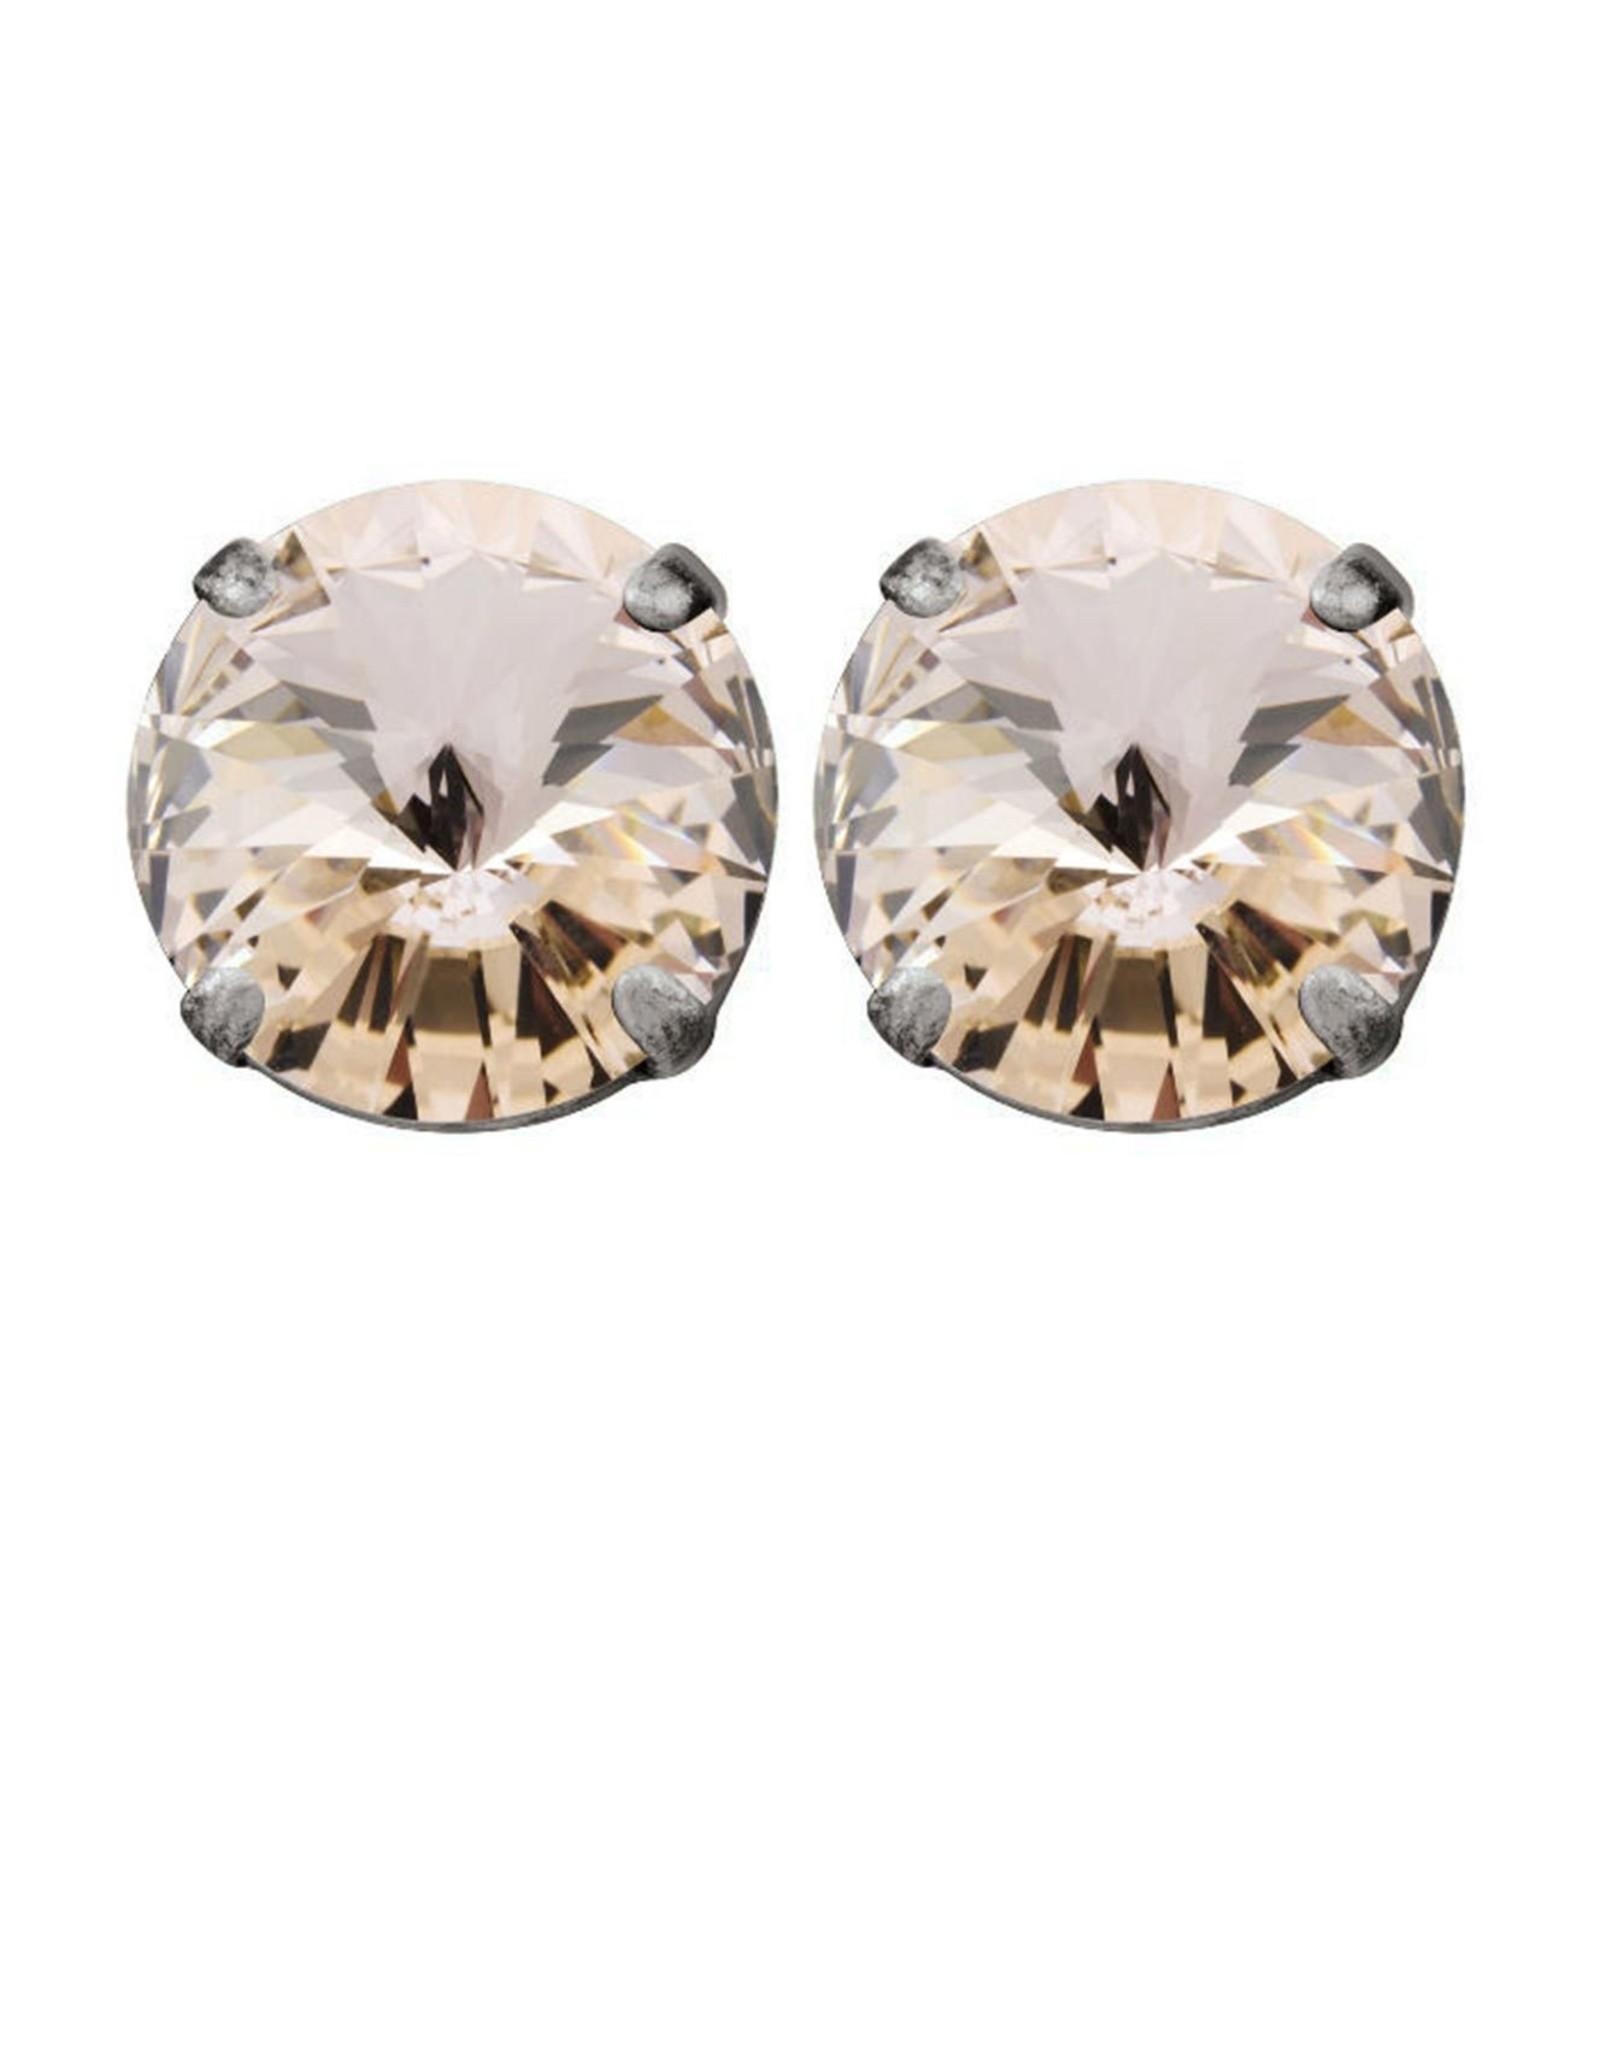 Rebekah Price Rebekah Price Rivoli Silver Stud Earrings